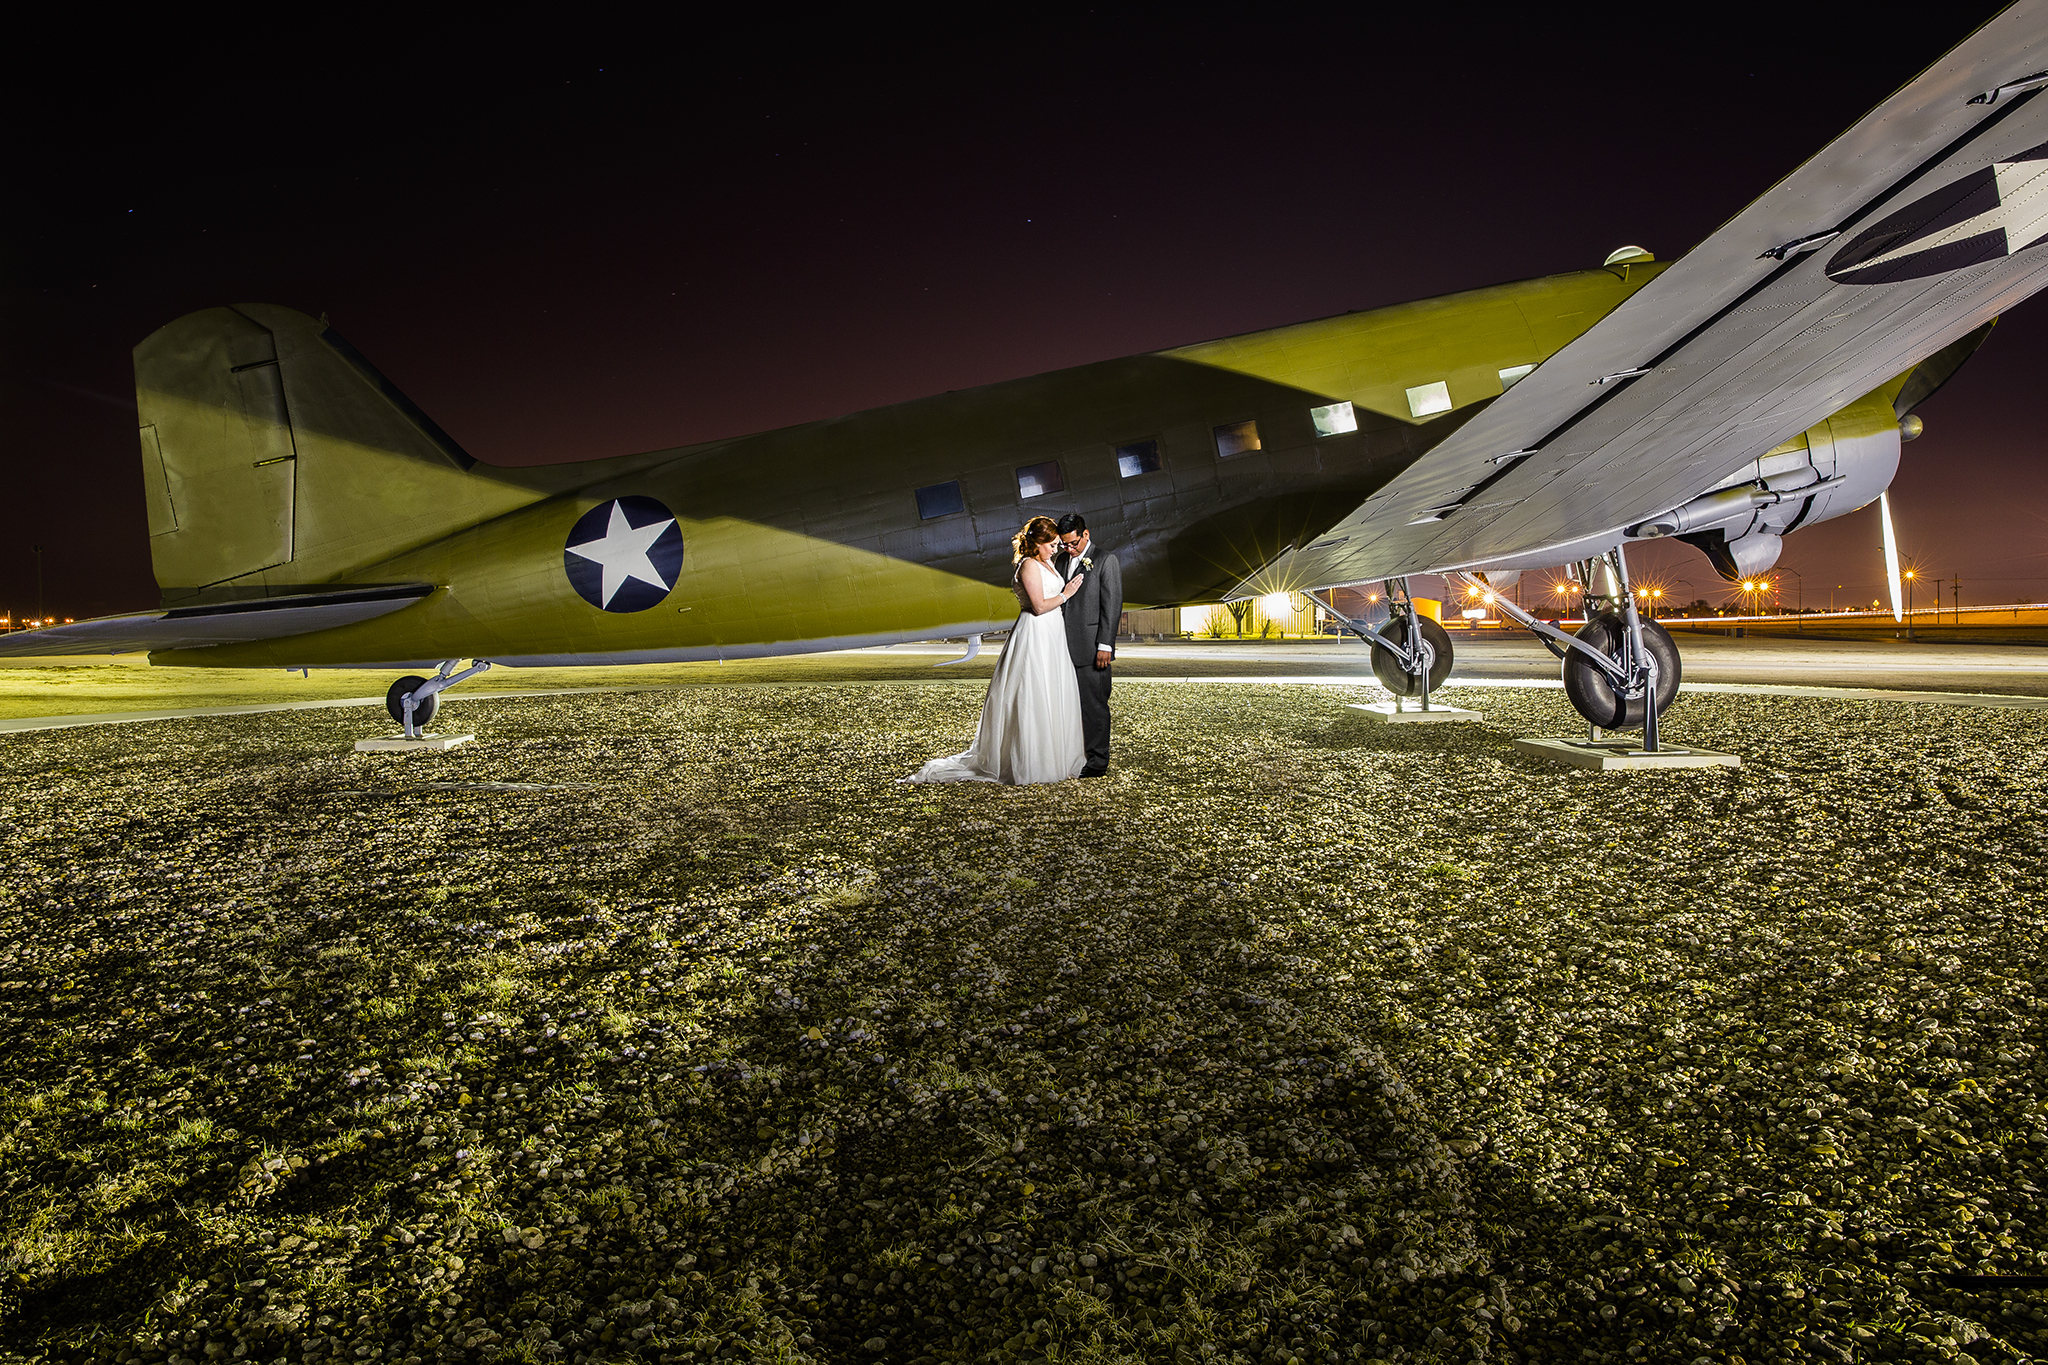 composite, world war II, lubbock silent wings museum, dramatic, edgy, creative, wedding portraits